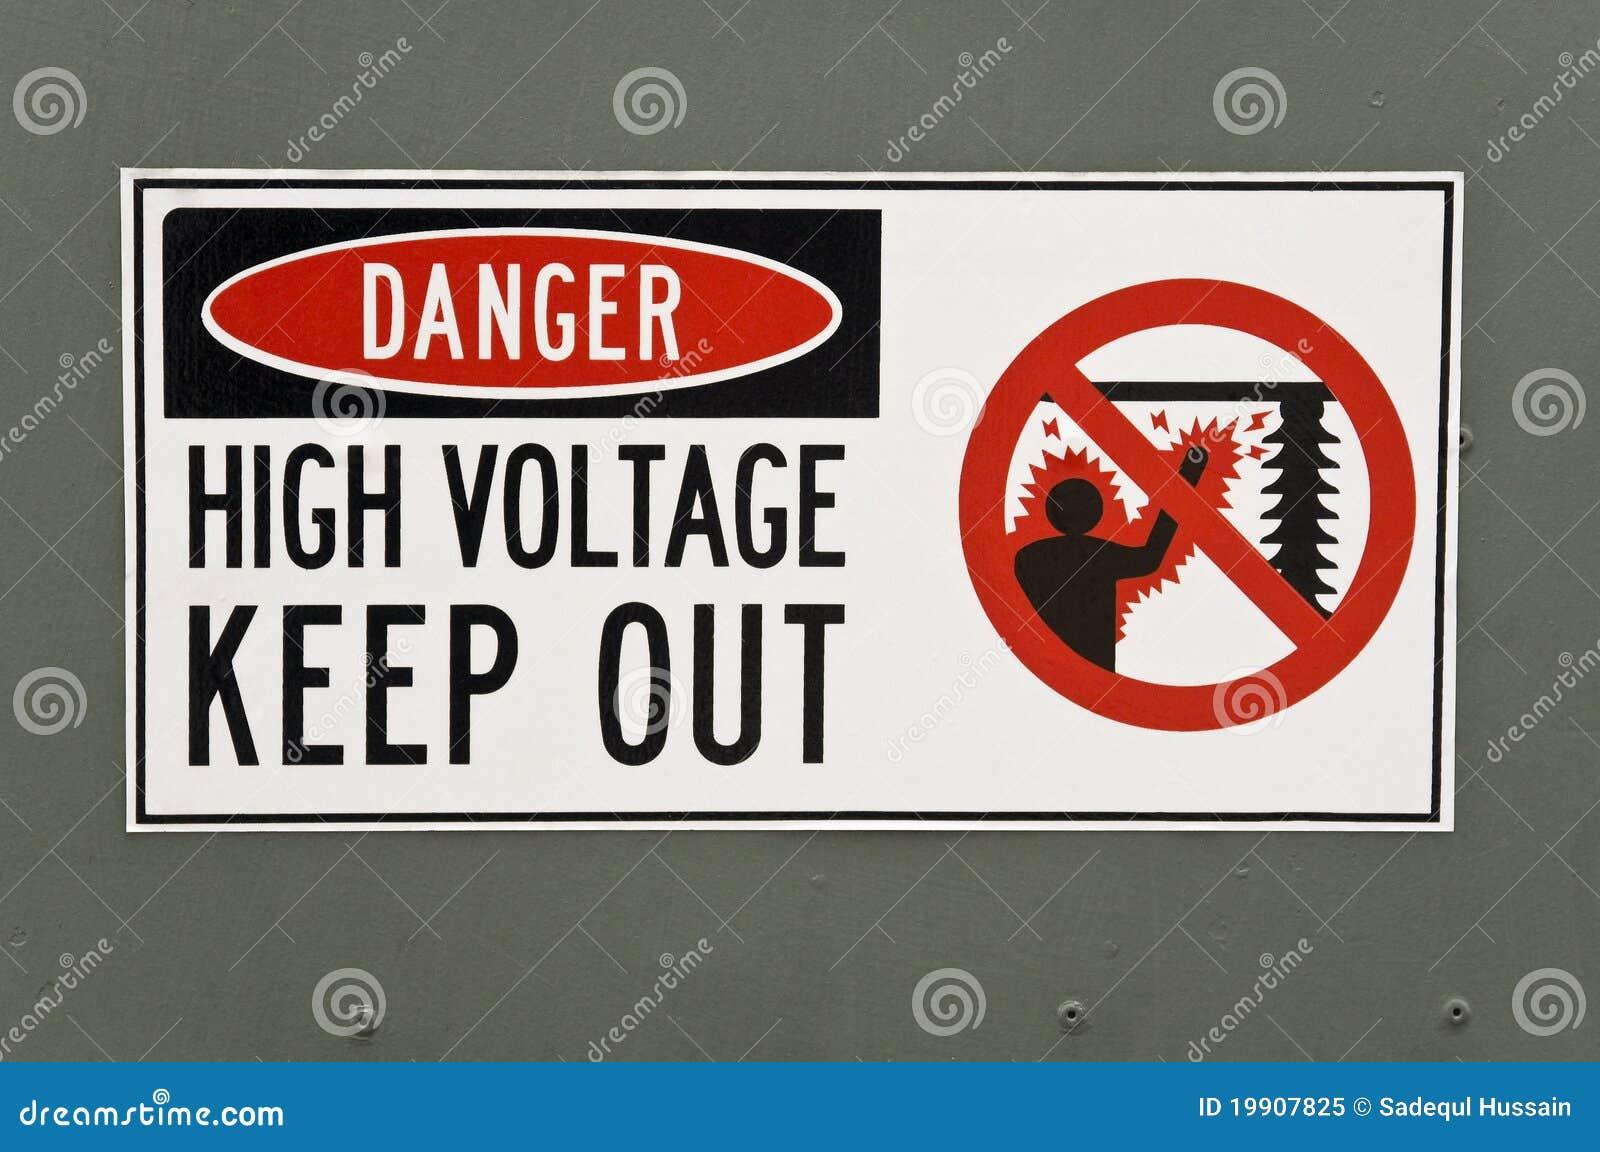 High Voltage Danger Sign stock image. Image of hazardous - 19907825